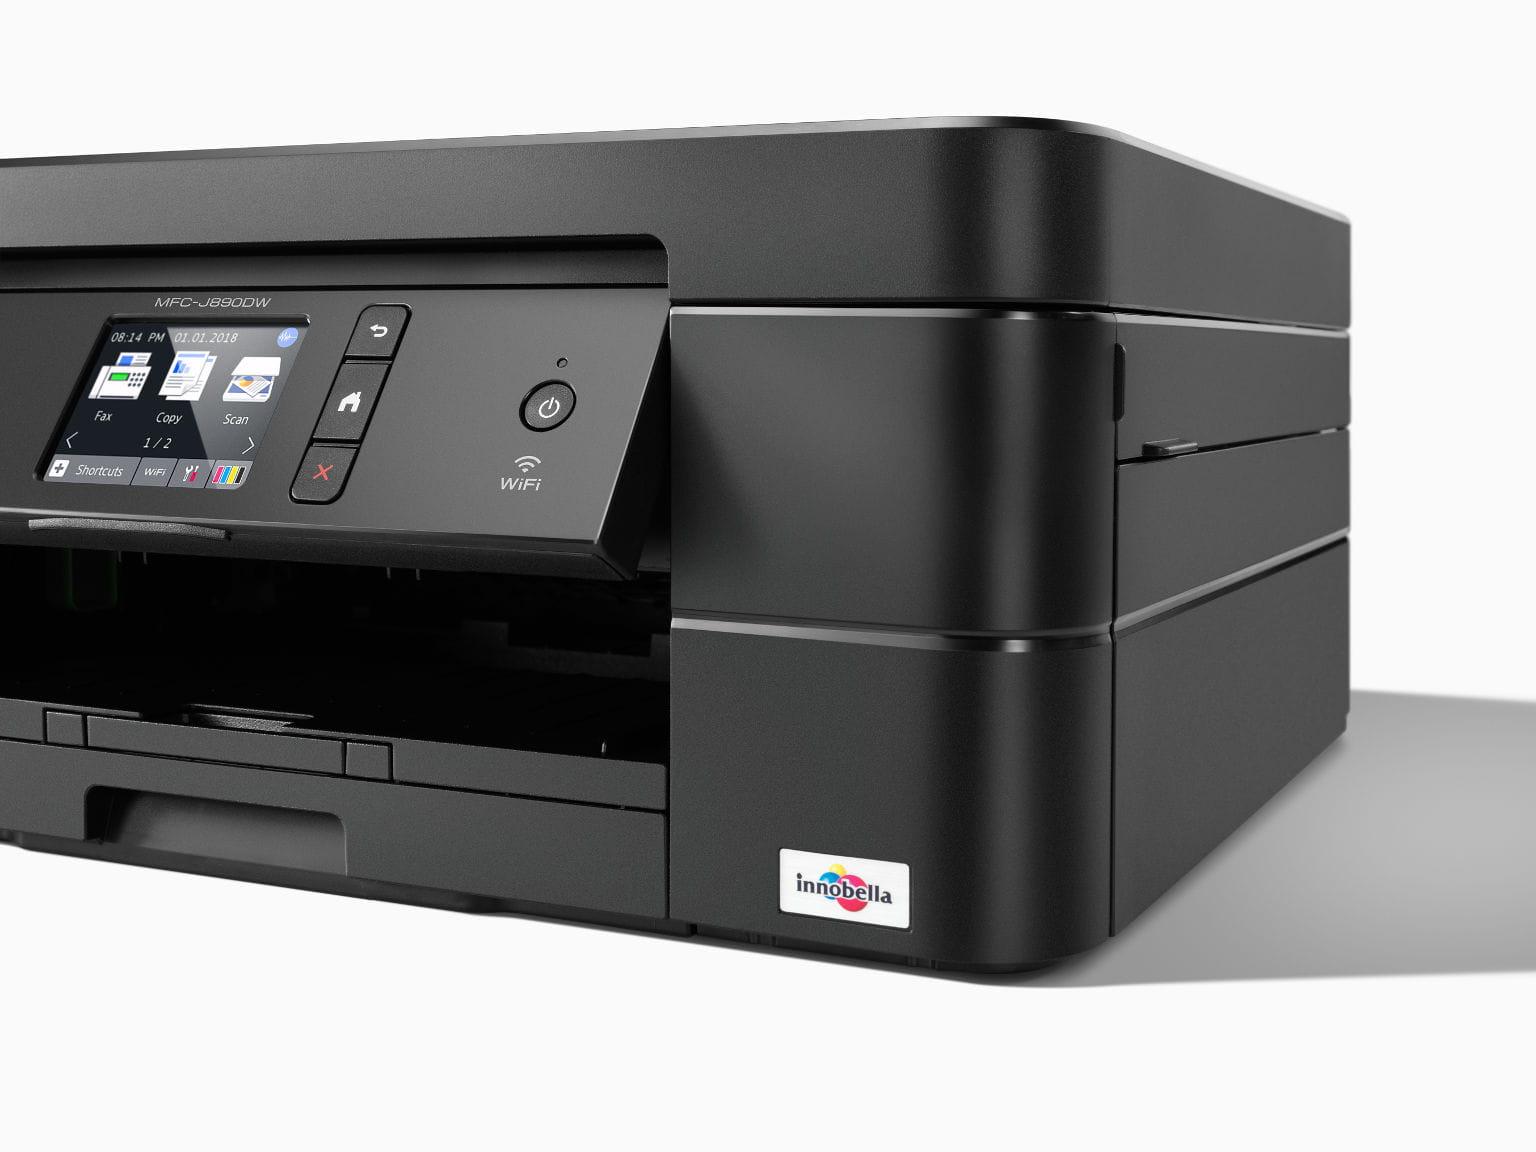 Impresora multifunción tinta MFC-J890DW Brother